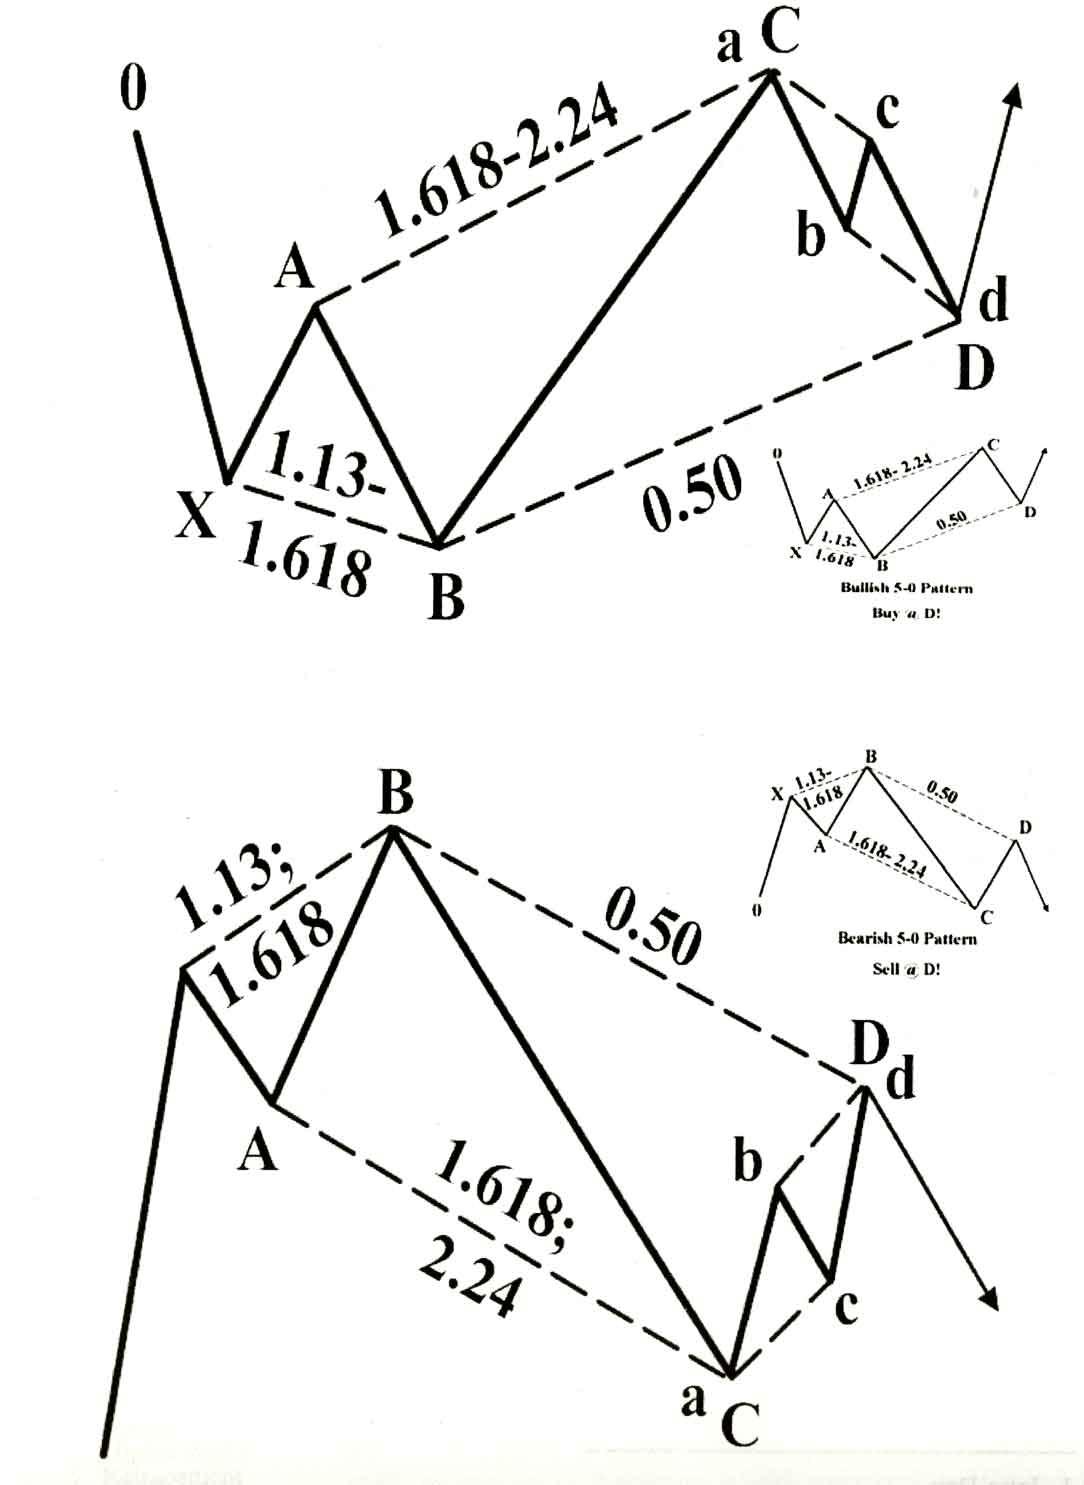 5-0 Pattern, الگوی 0-5